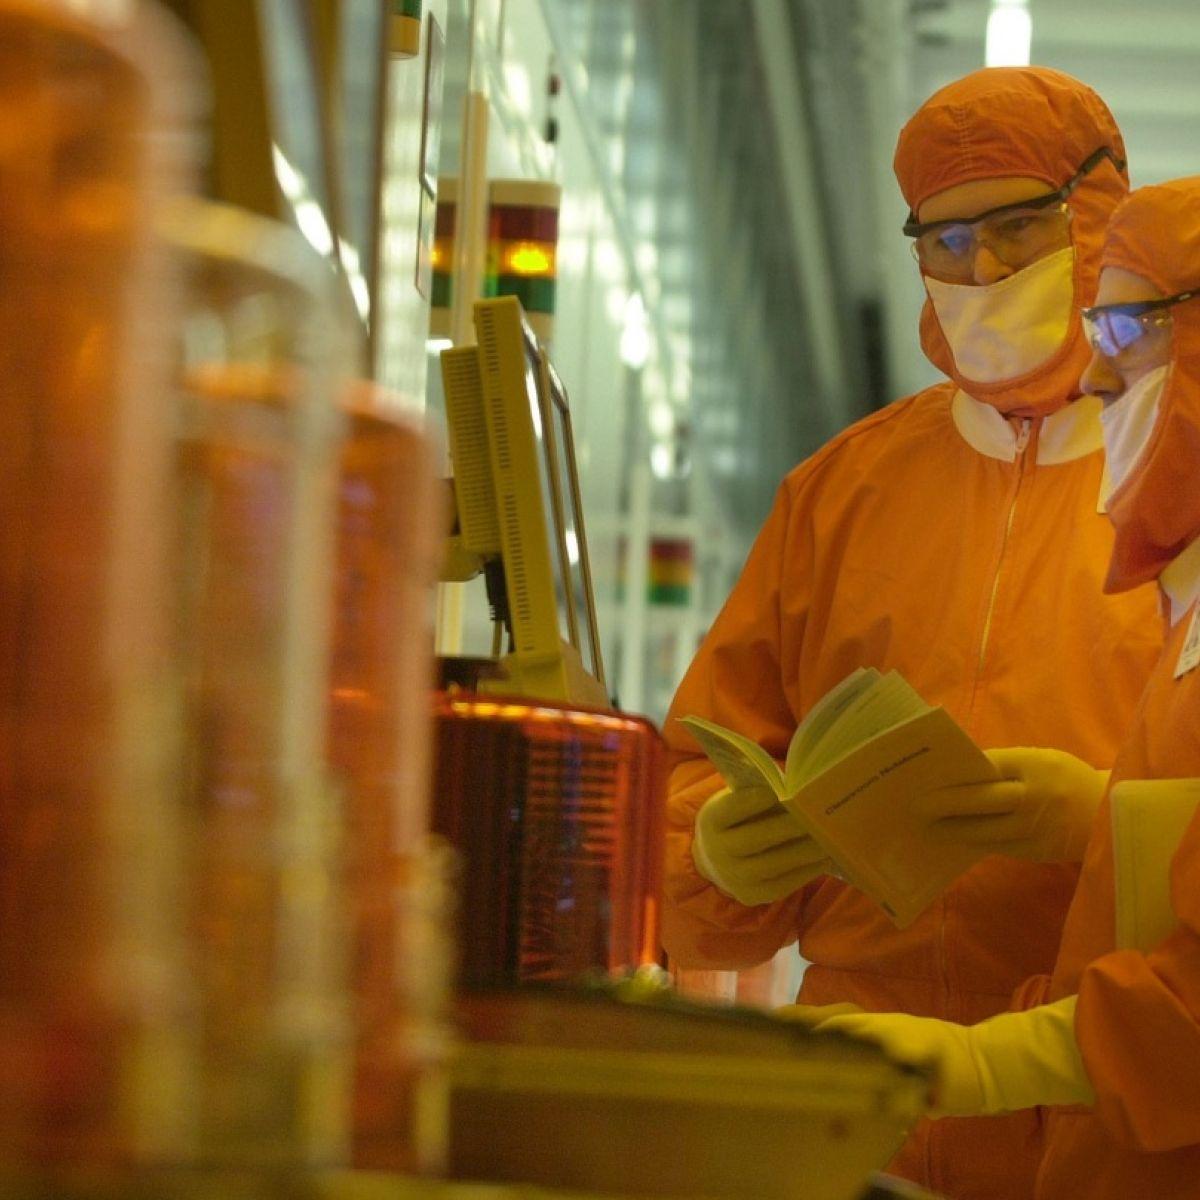 Intel prepared to invest $8bn in new Leixlip development